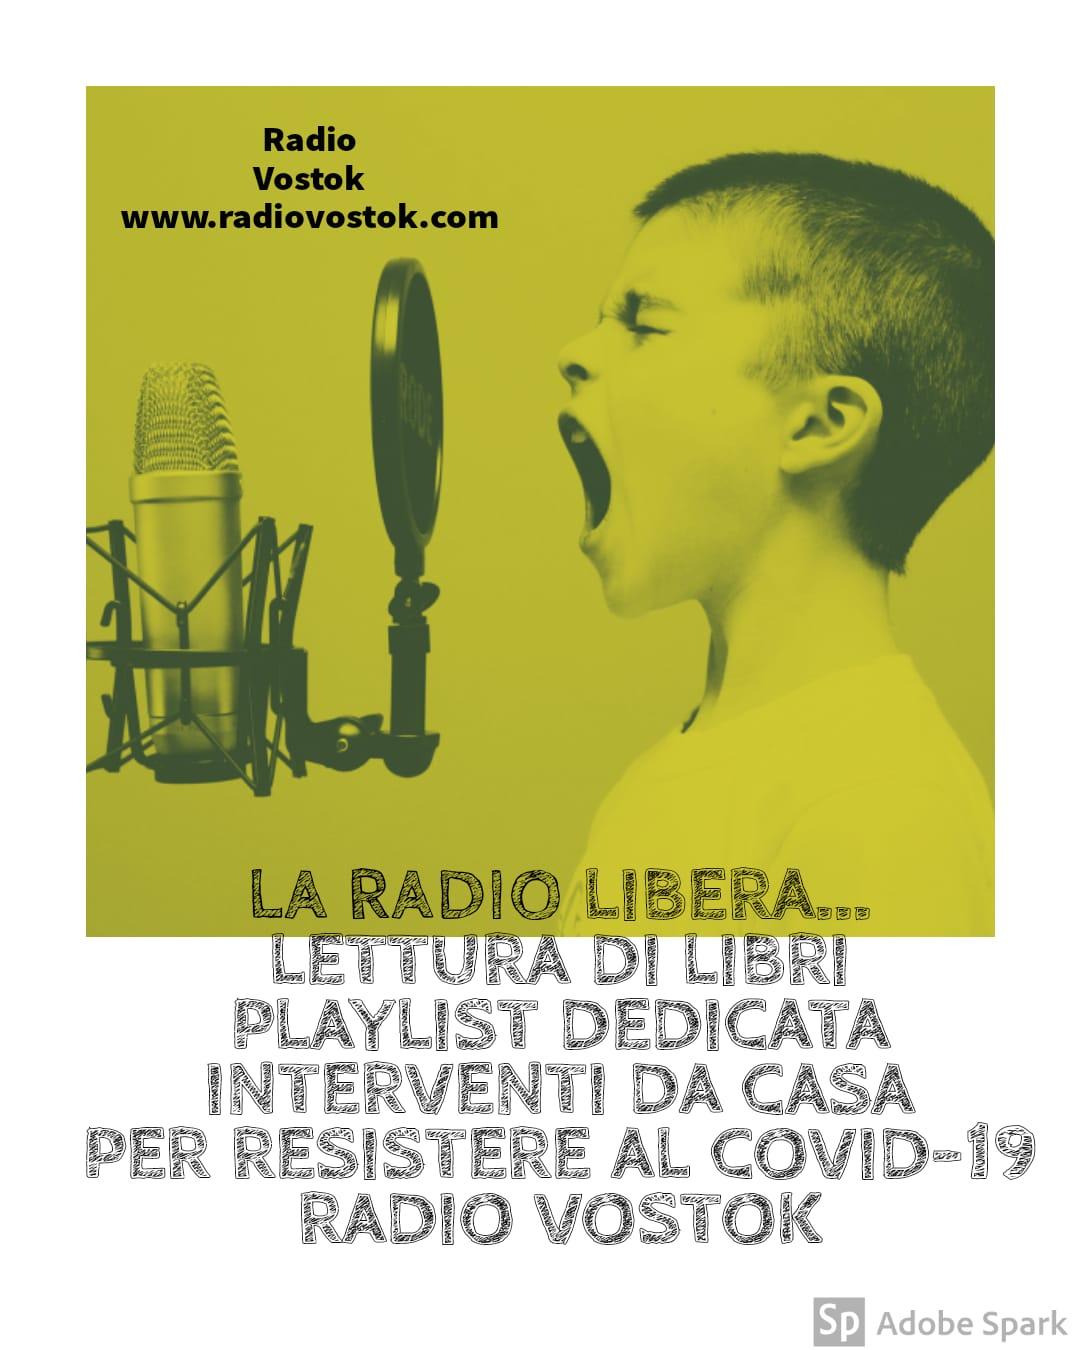 La radio libera